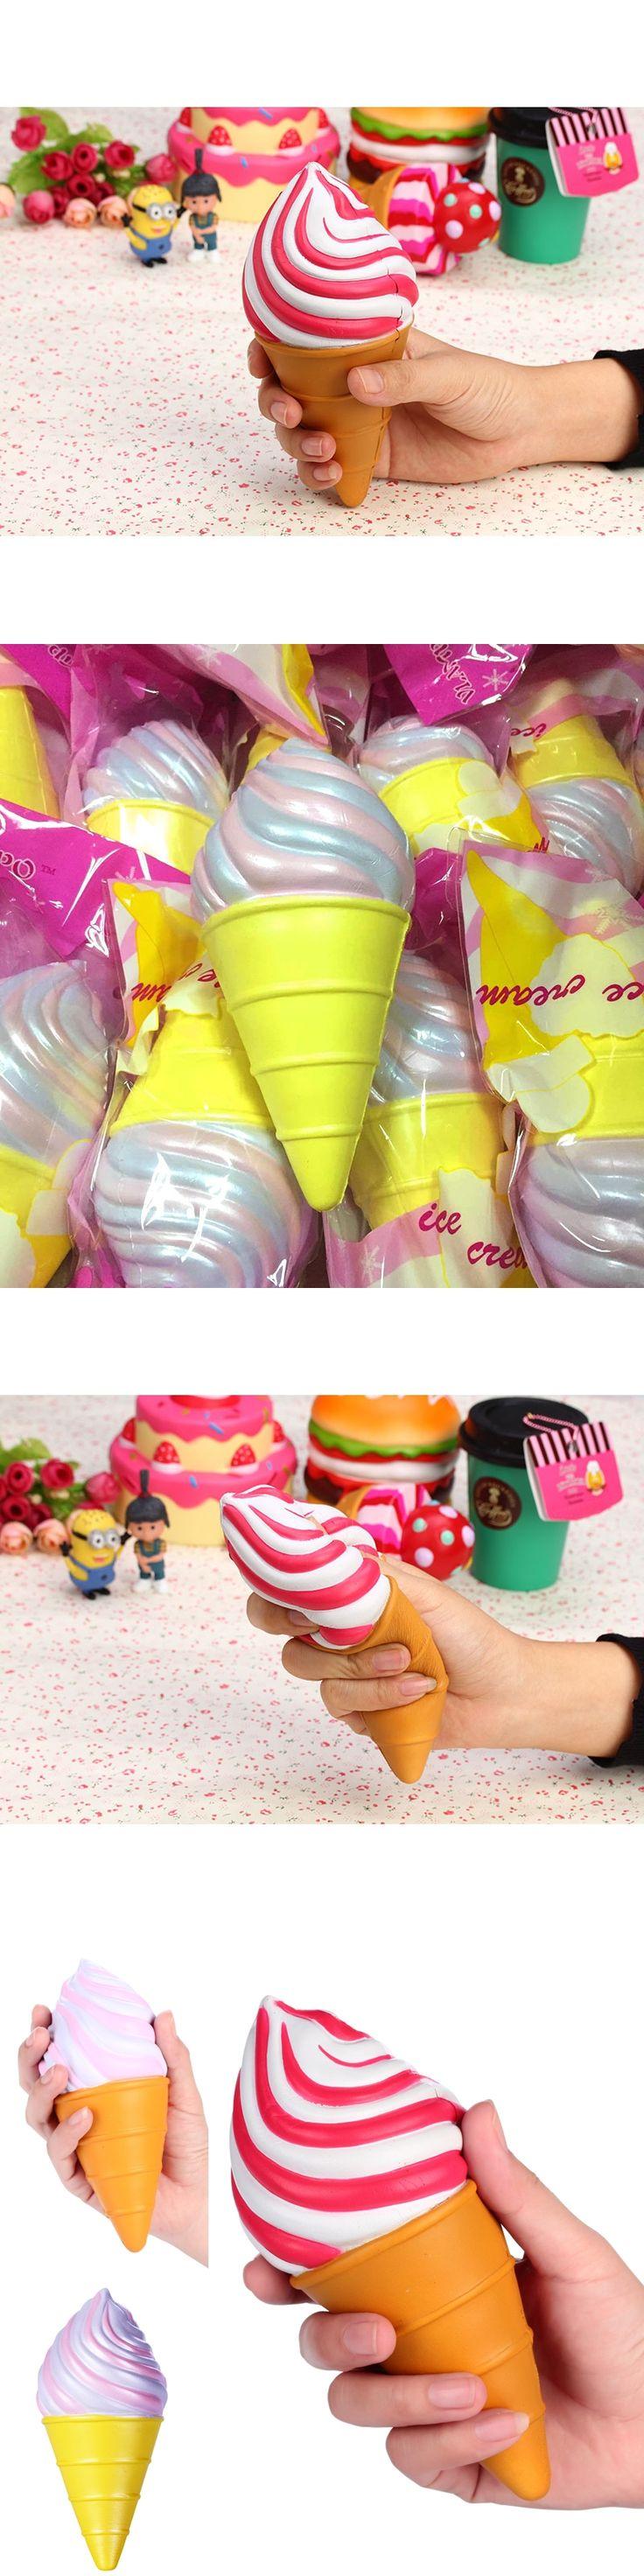 1pc Retail Ice cream Squishy Slow Rising Squishy Toys Vlampo Squishies Wholesale Torch ice cream Cone Licensed Original 3 color